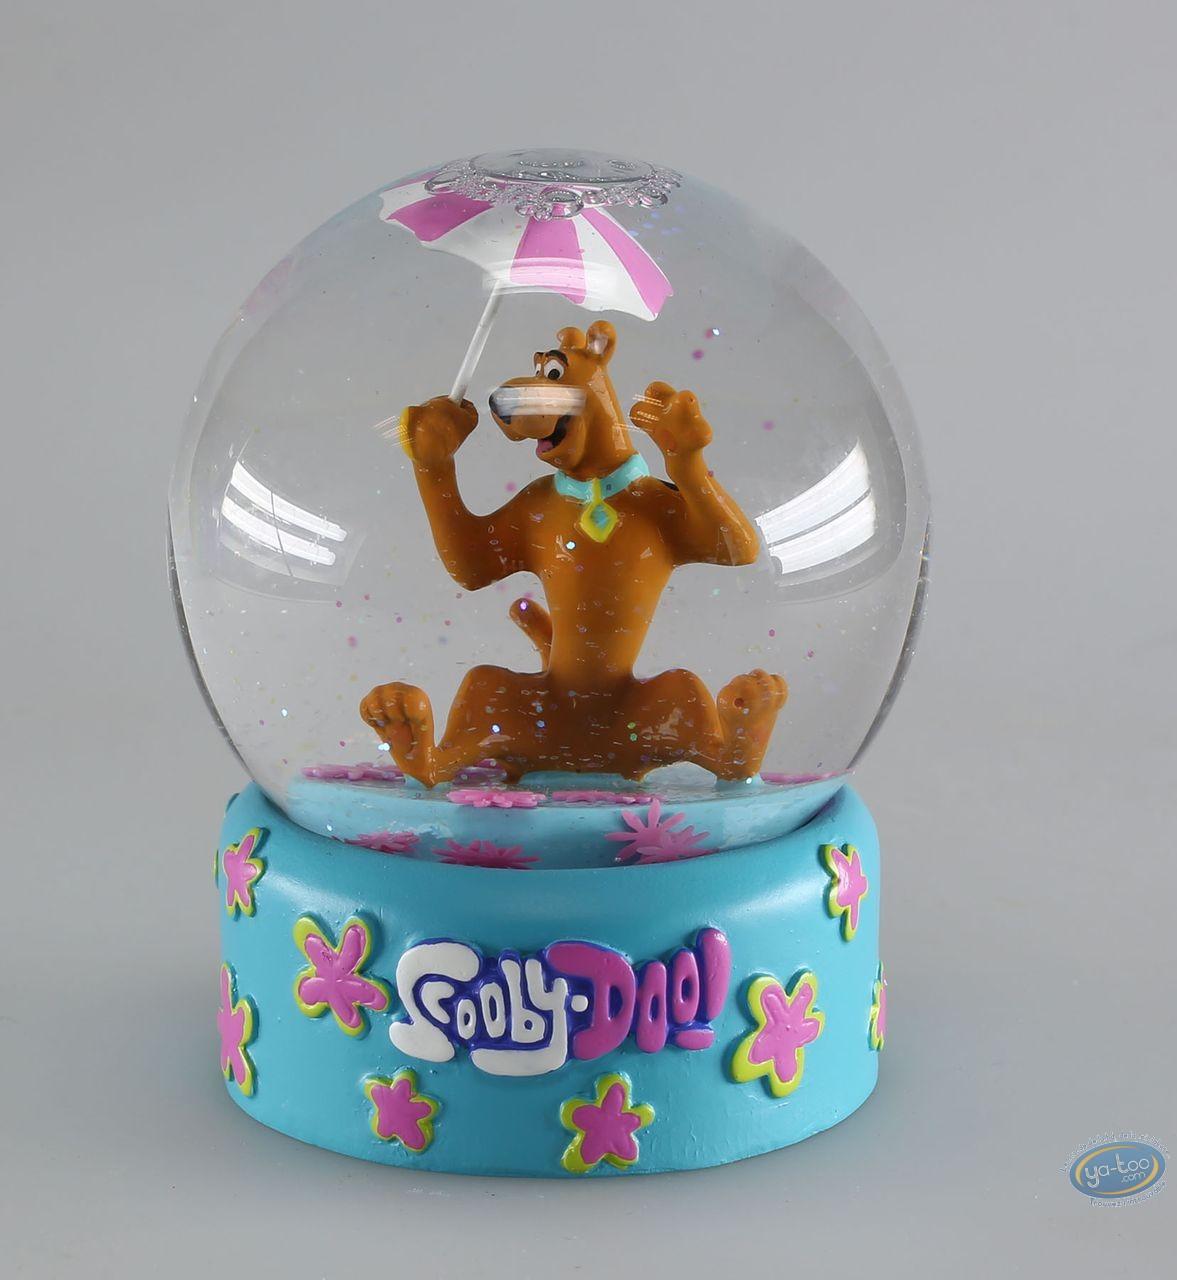 Deco, Scooby-Doo : Small snow globe Scoobydoo